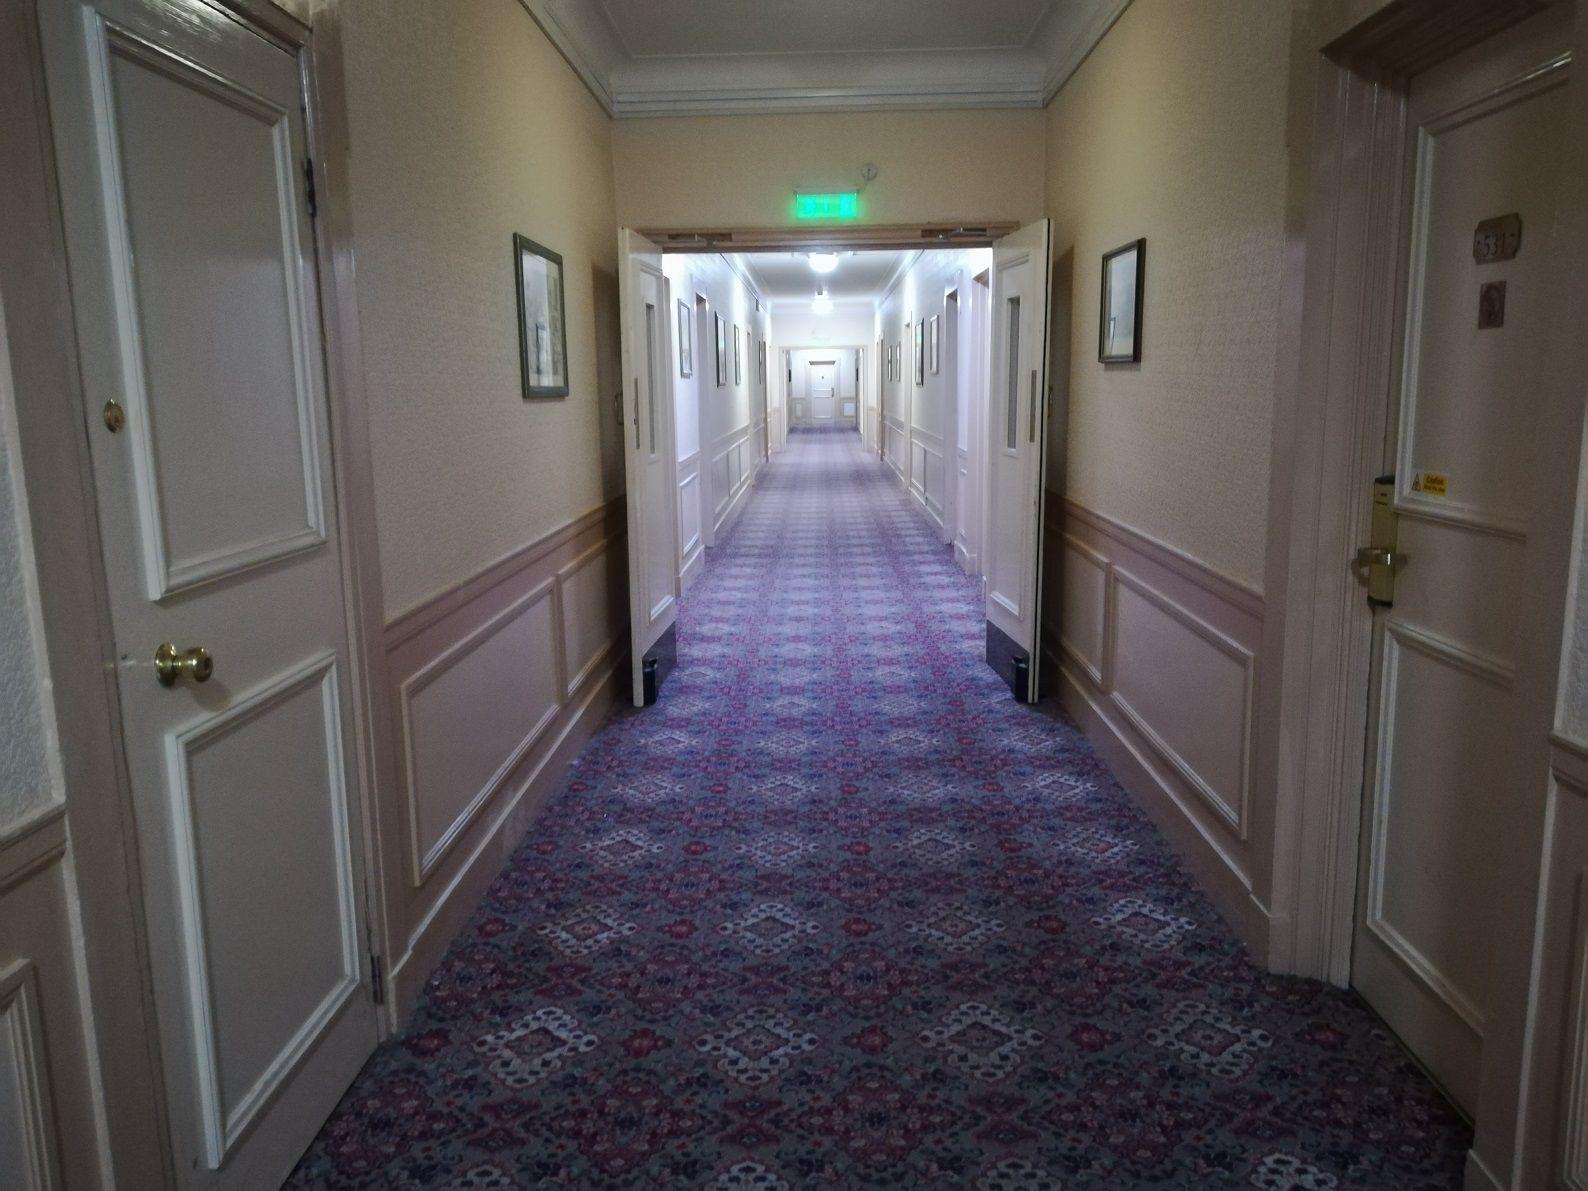 Image may contain: Flooring, Corridor